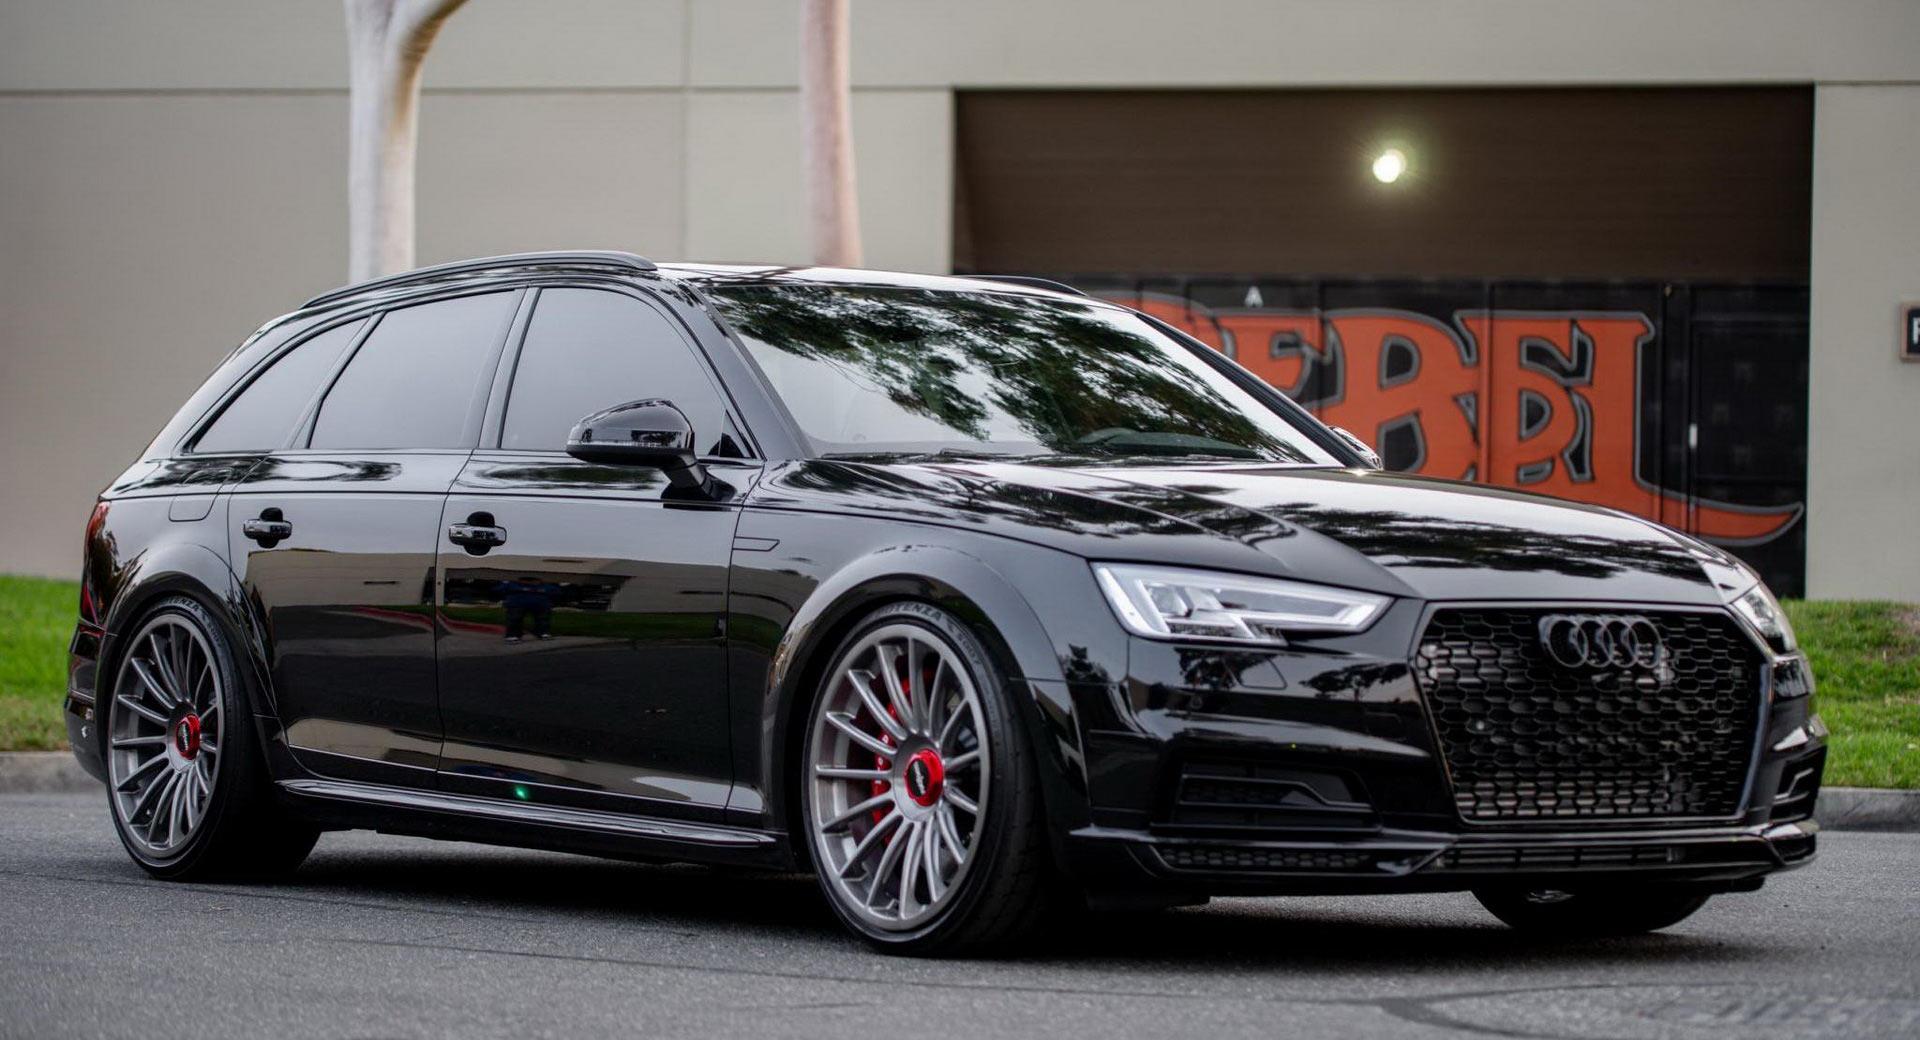 Kekurangan Audi Allroad 2018 Tangguh